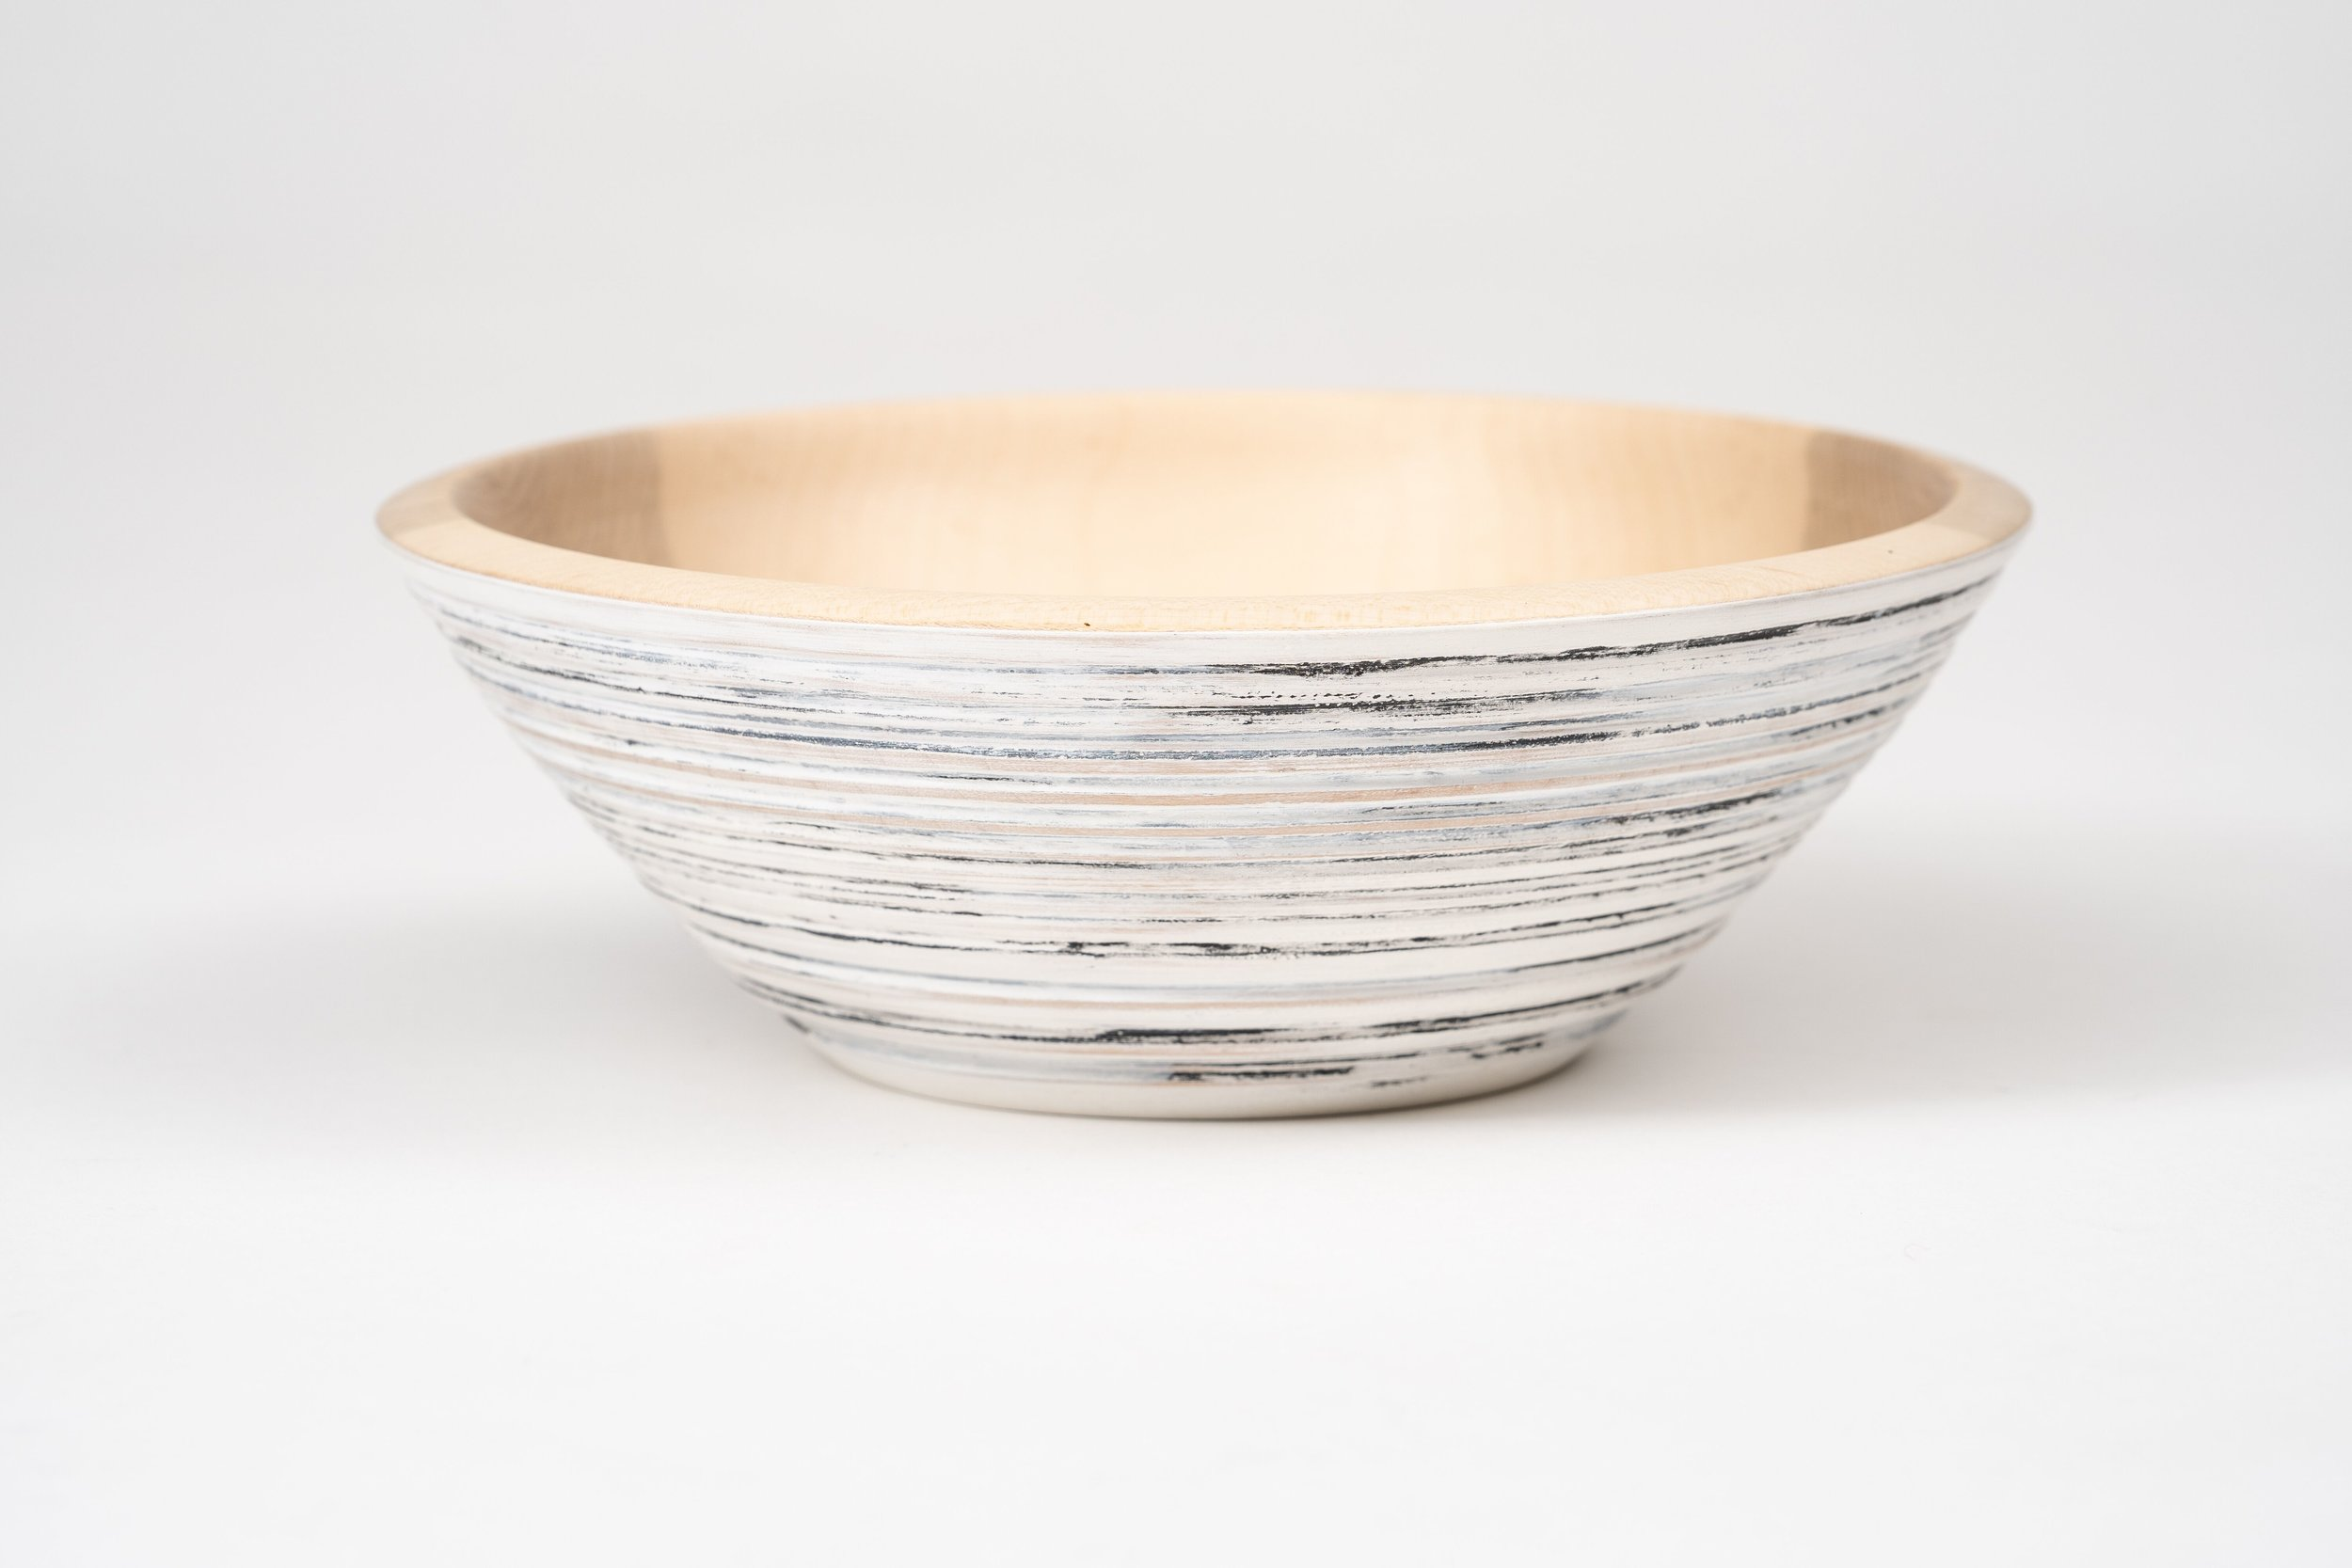 black-white-grey-modern-contemporary-salad-bowl-dean-babin.jpeg